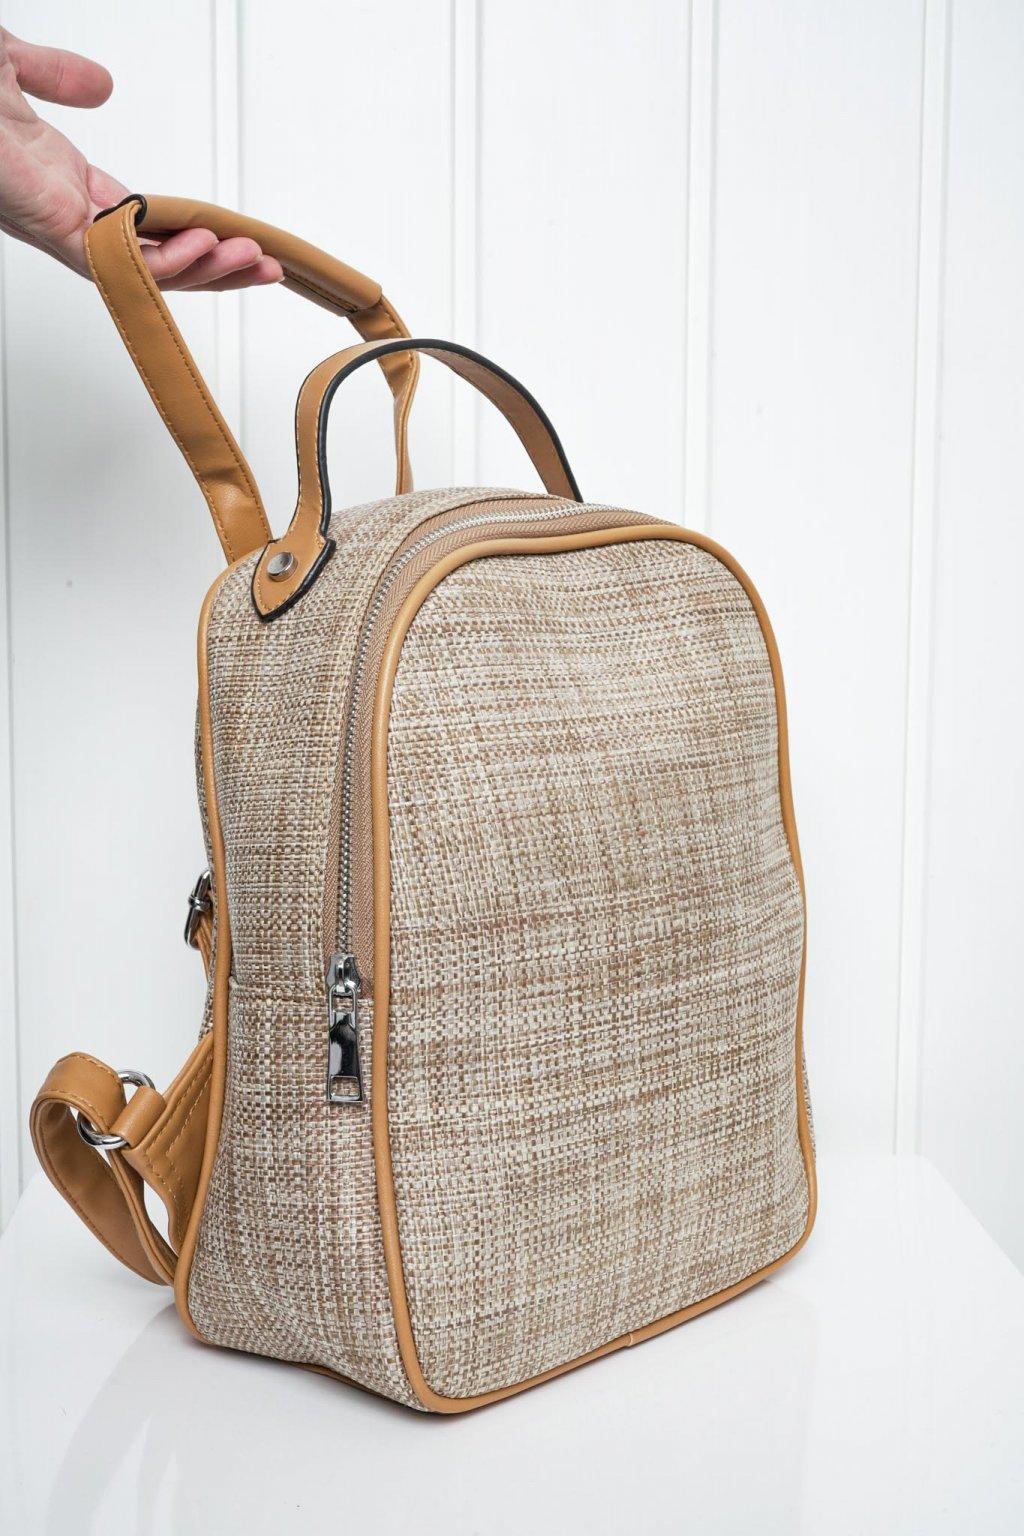 Kabelka, crossbody, ruksak, shopping bag, shopperka, 411